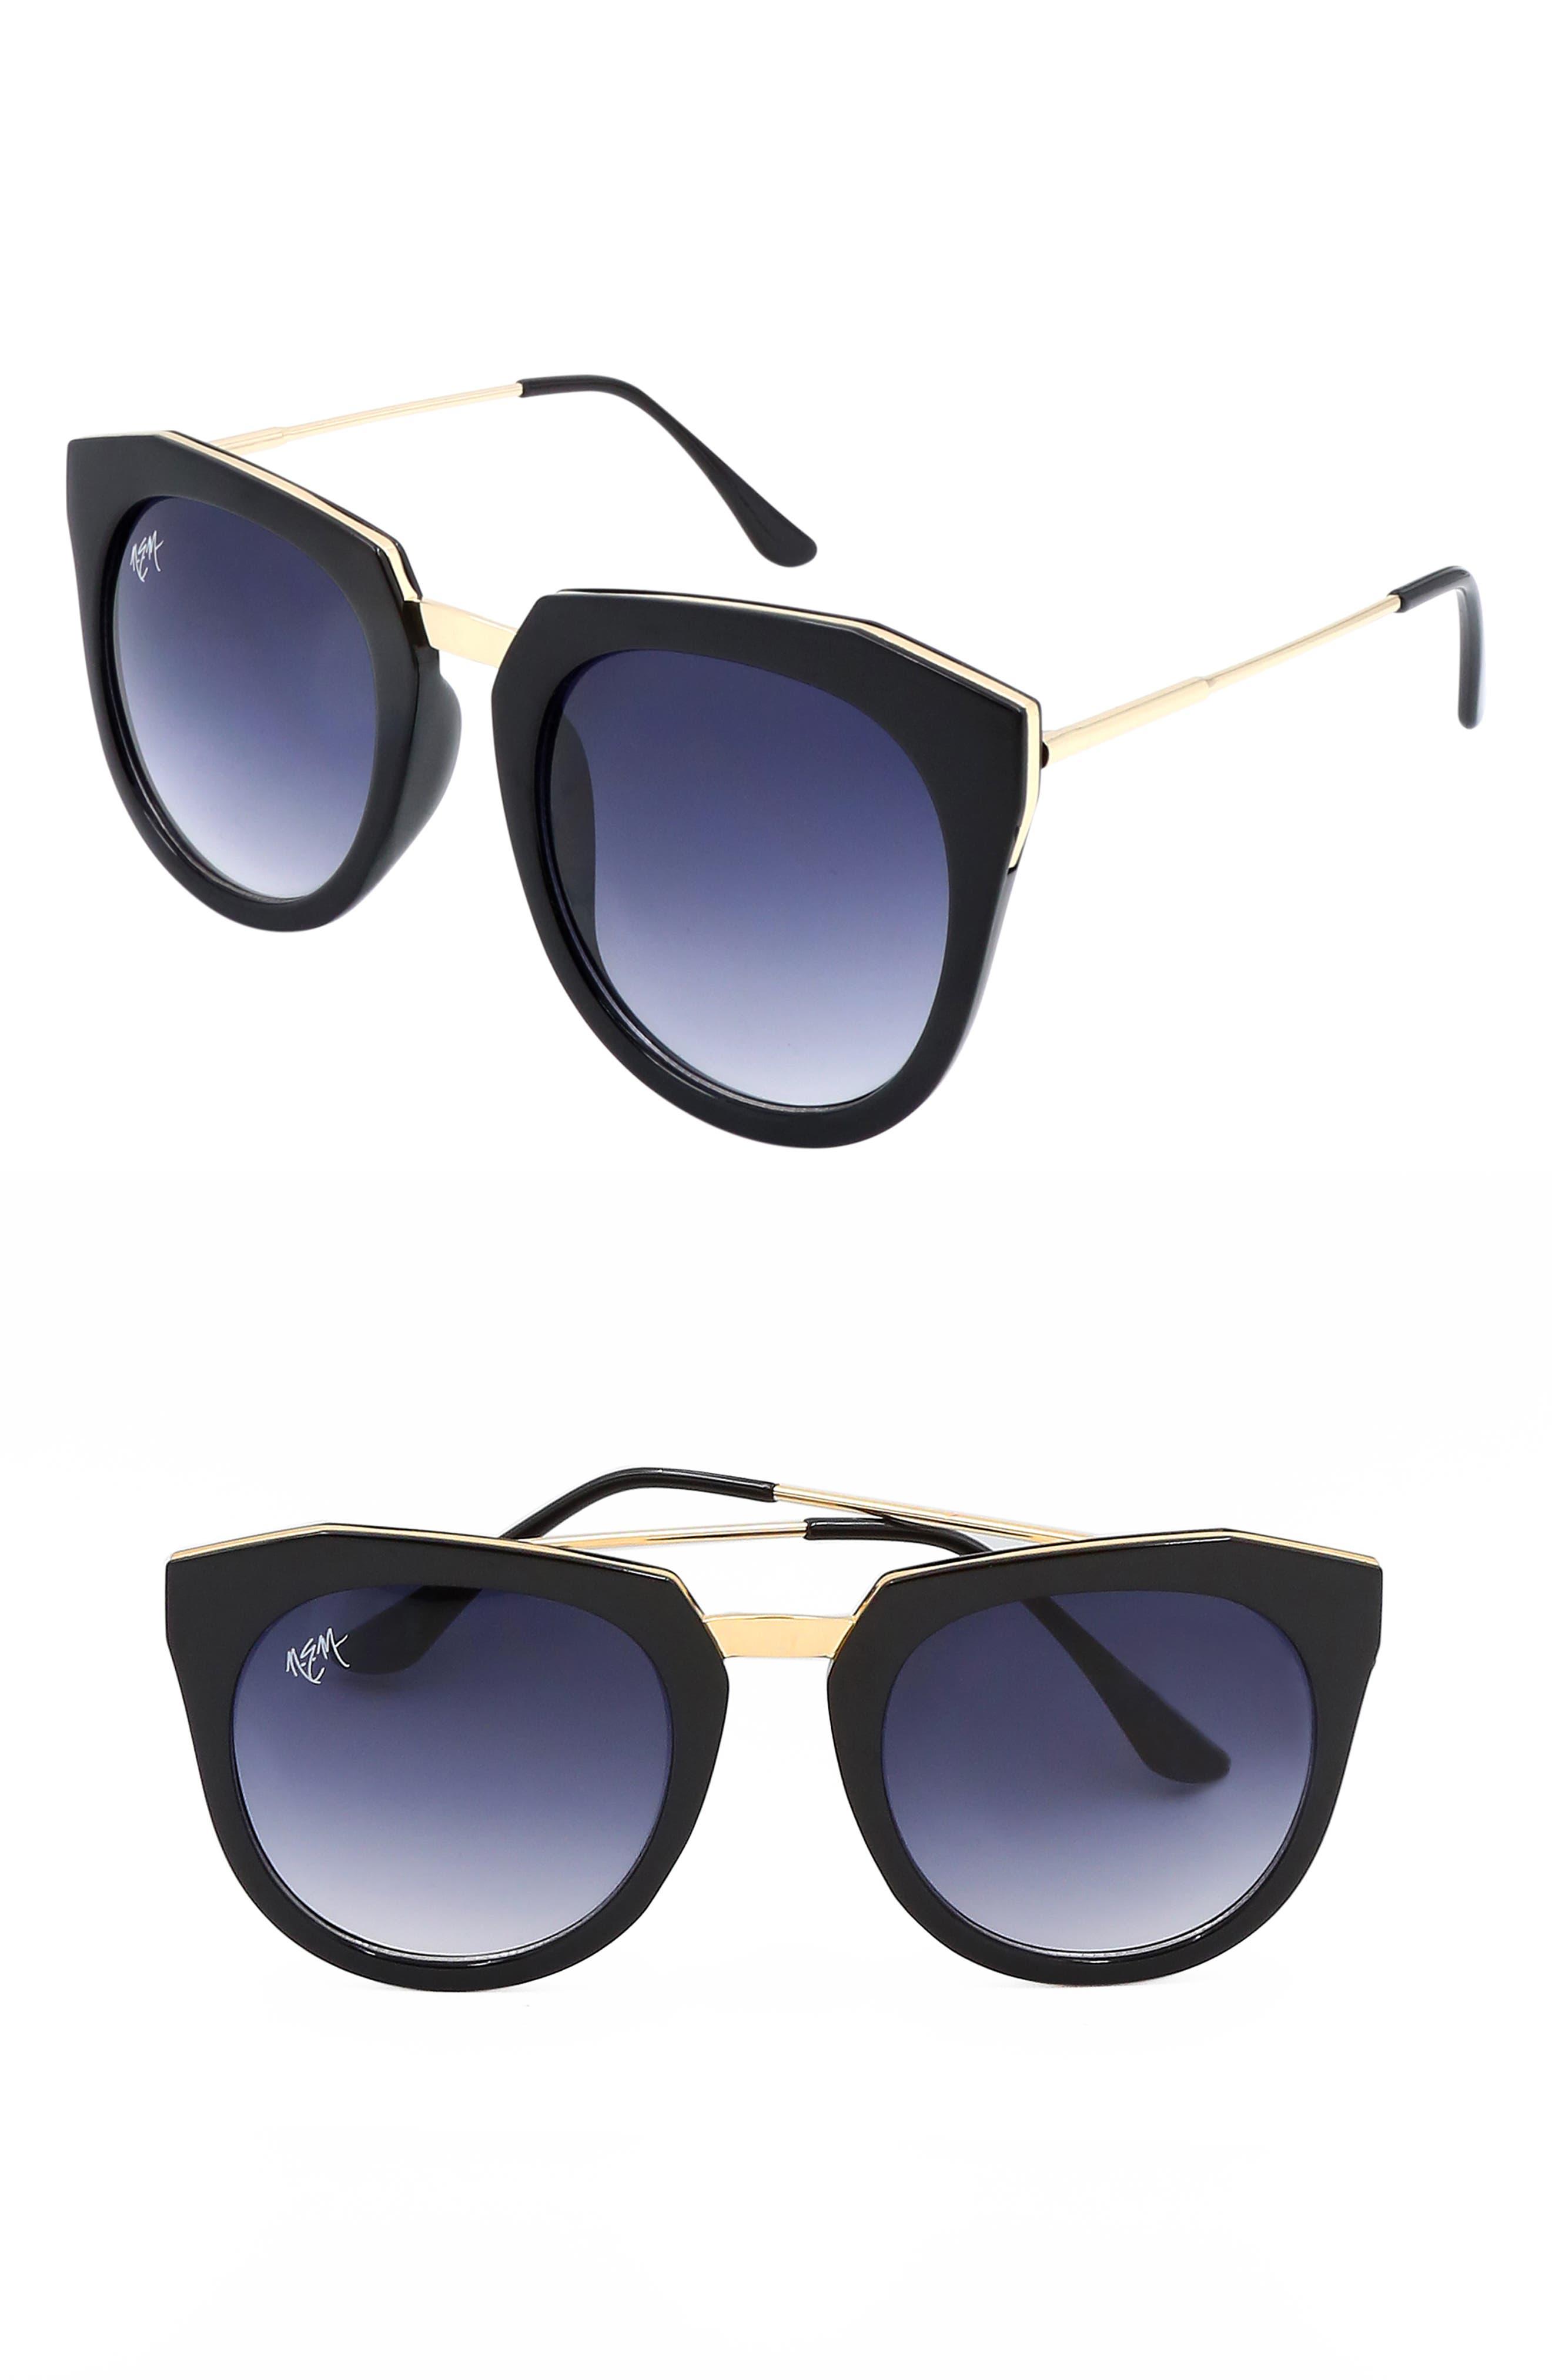 Nem Haute Line 55Mm Angular Sunglasses - Black W Grey Gradient Lens